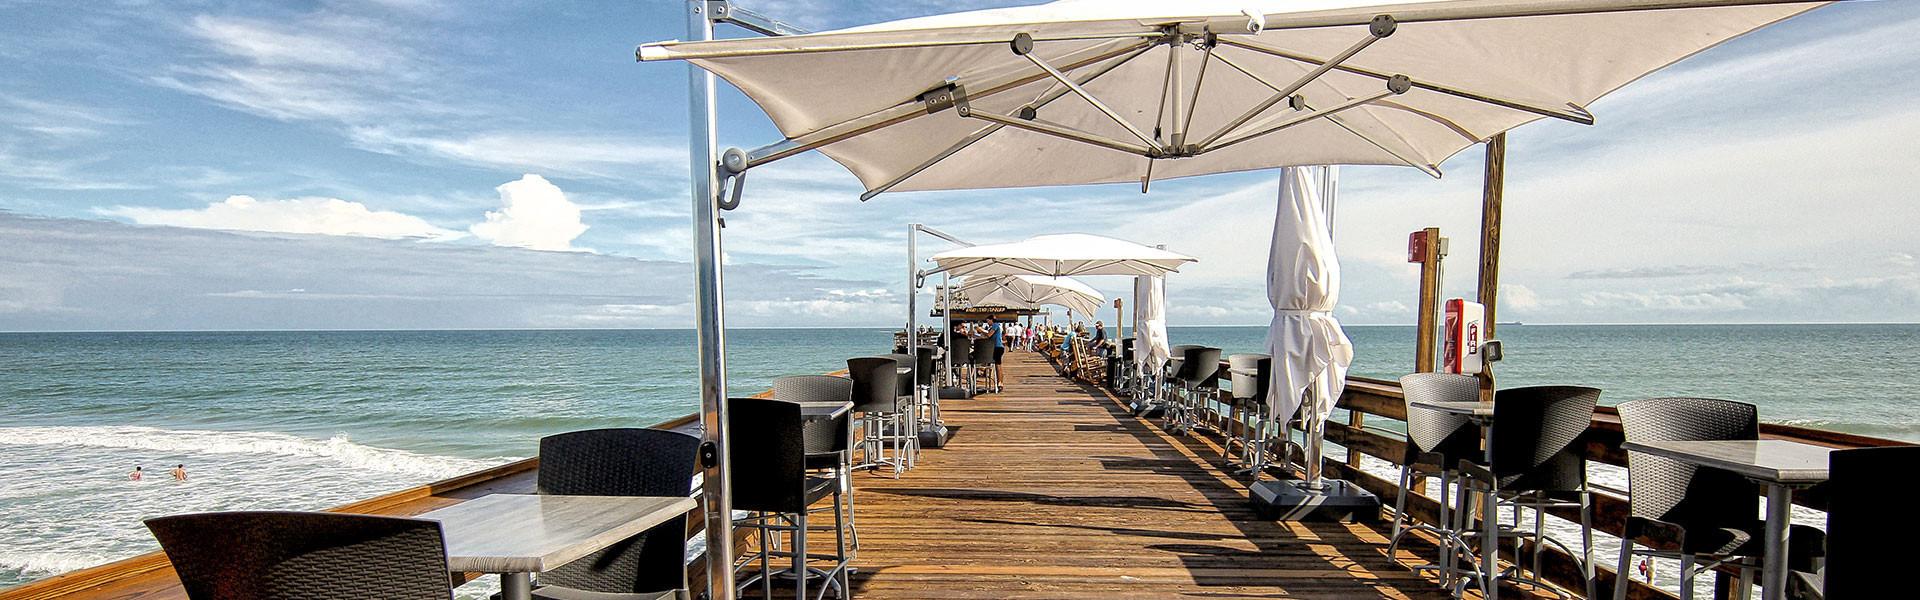 Cocoa Beach Pier in Cocoa Beach FL is the best Cocoa Beach place to be in Cocoa Beach | Westgate Coca Beach Resort